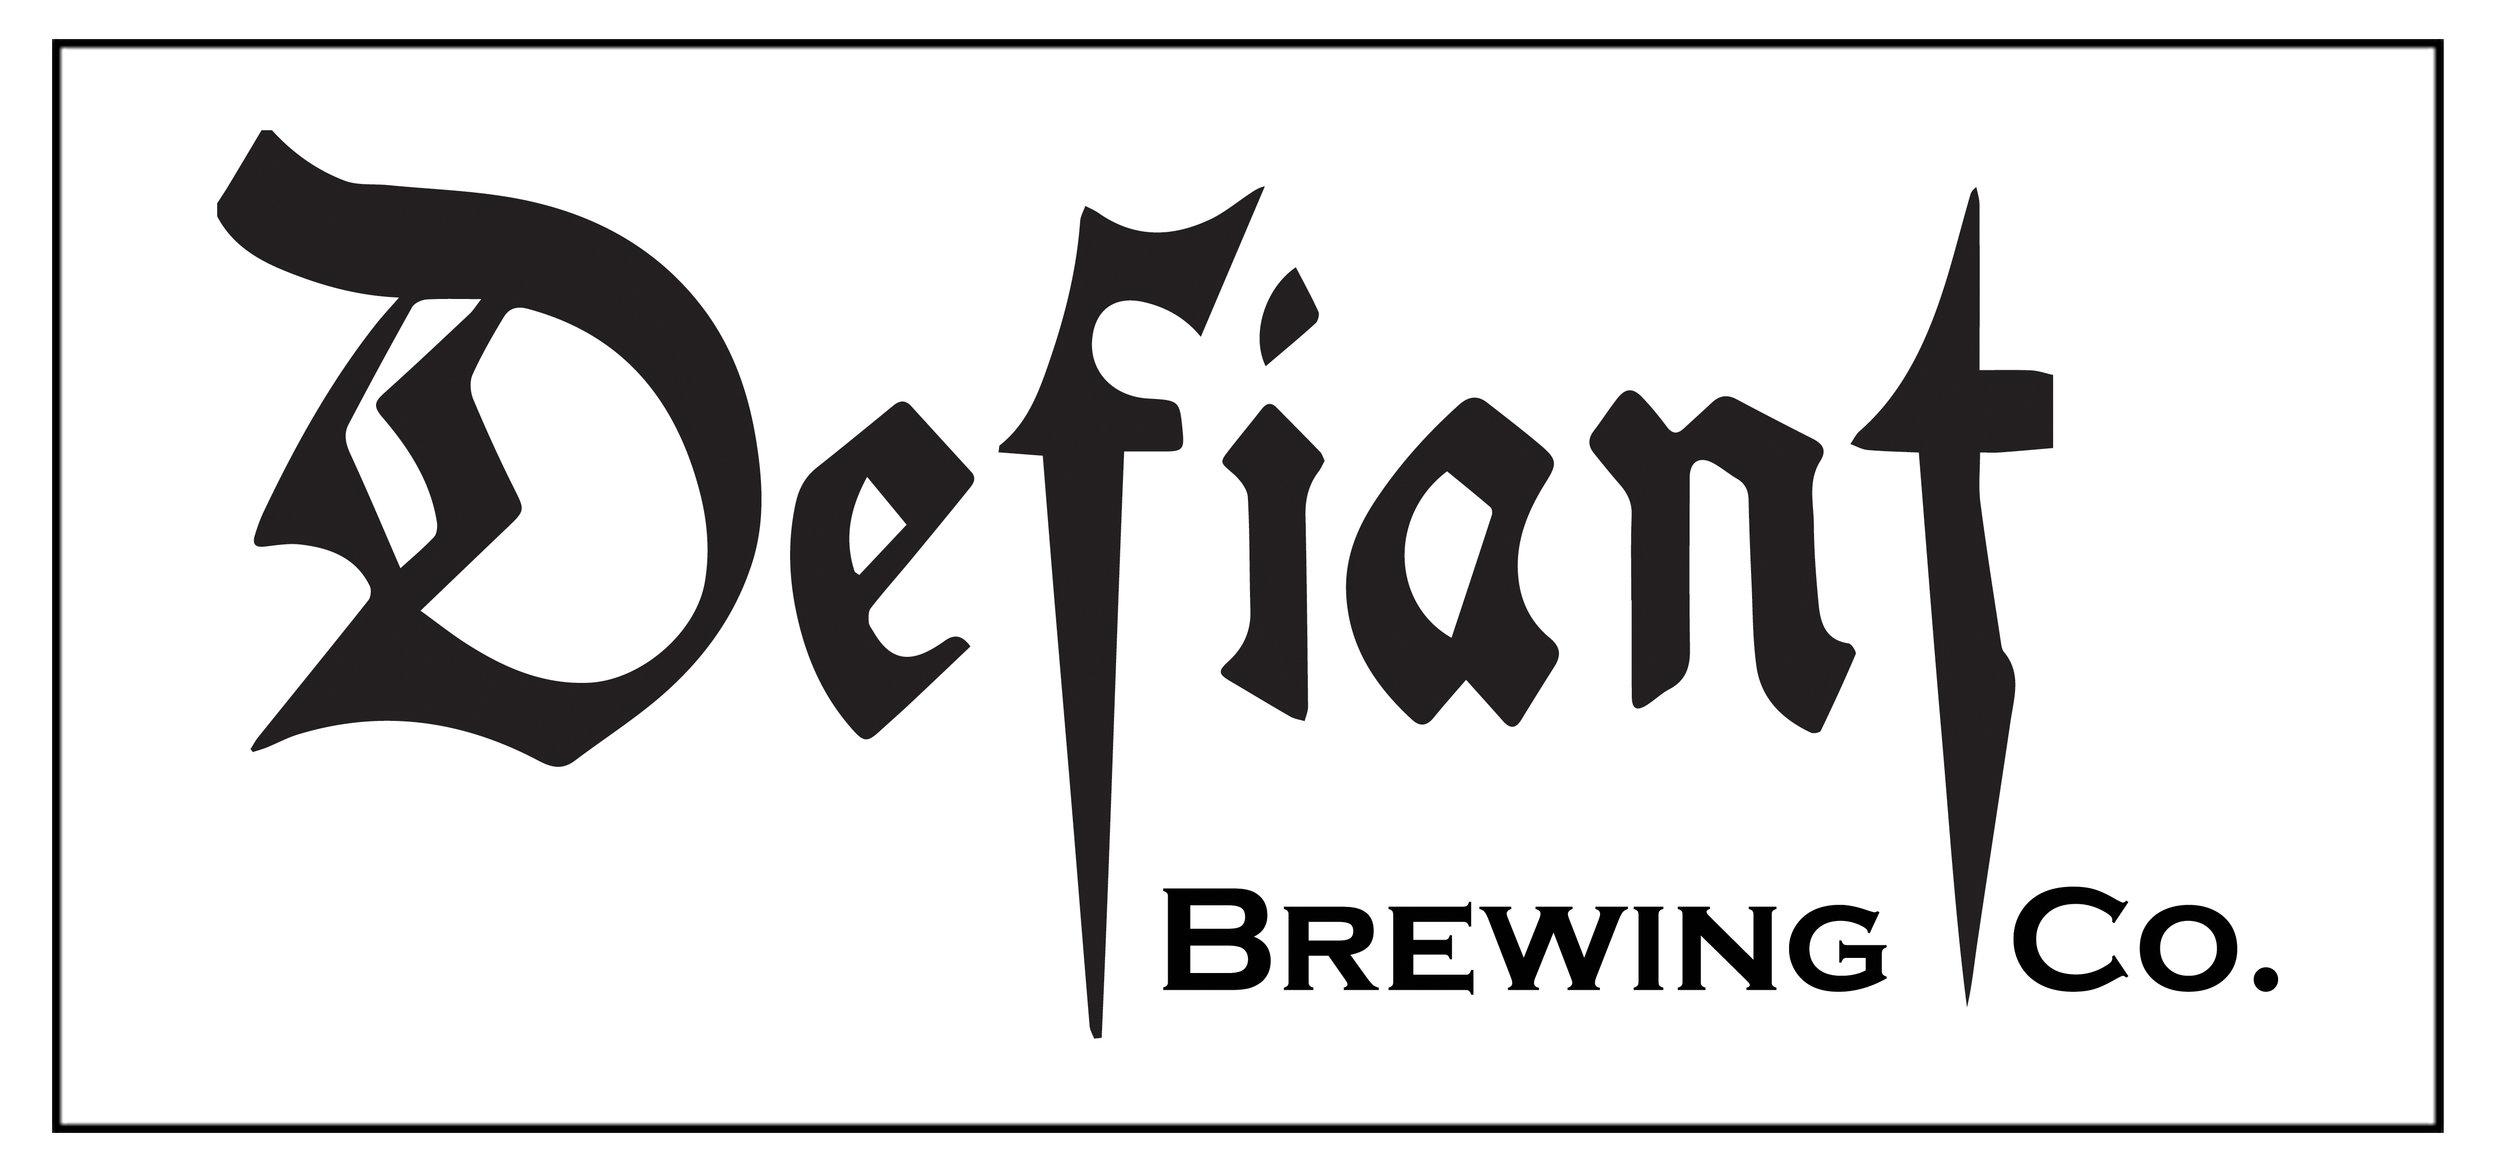 defiant_box_logo_white.jpg